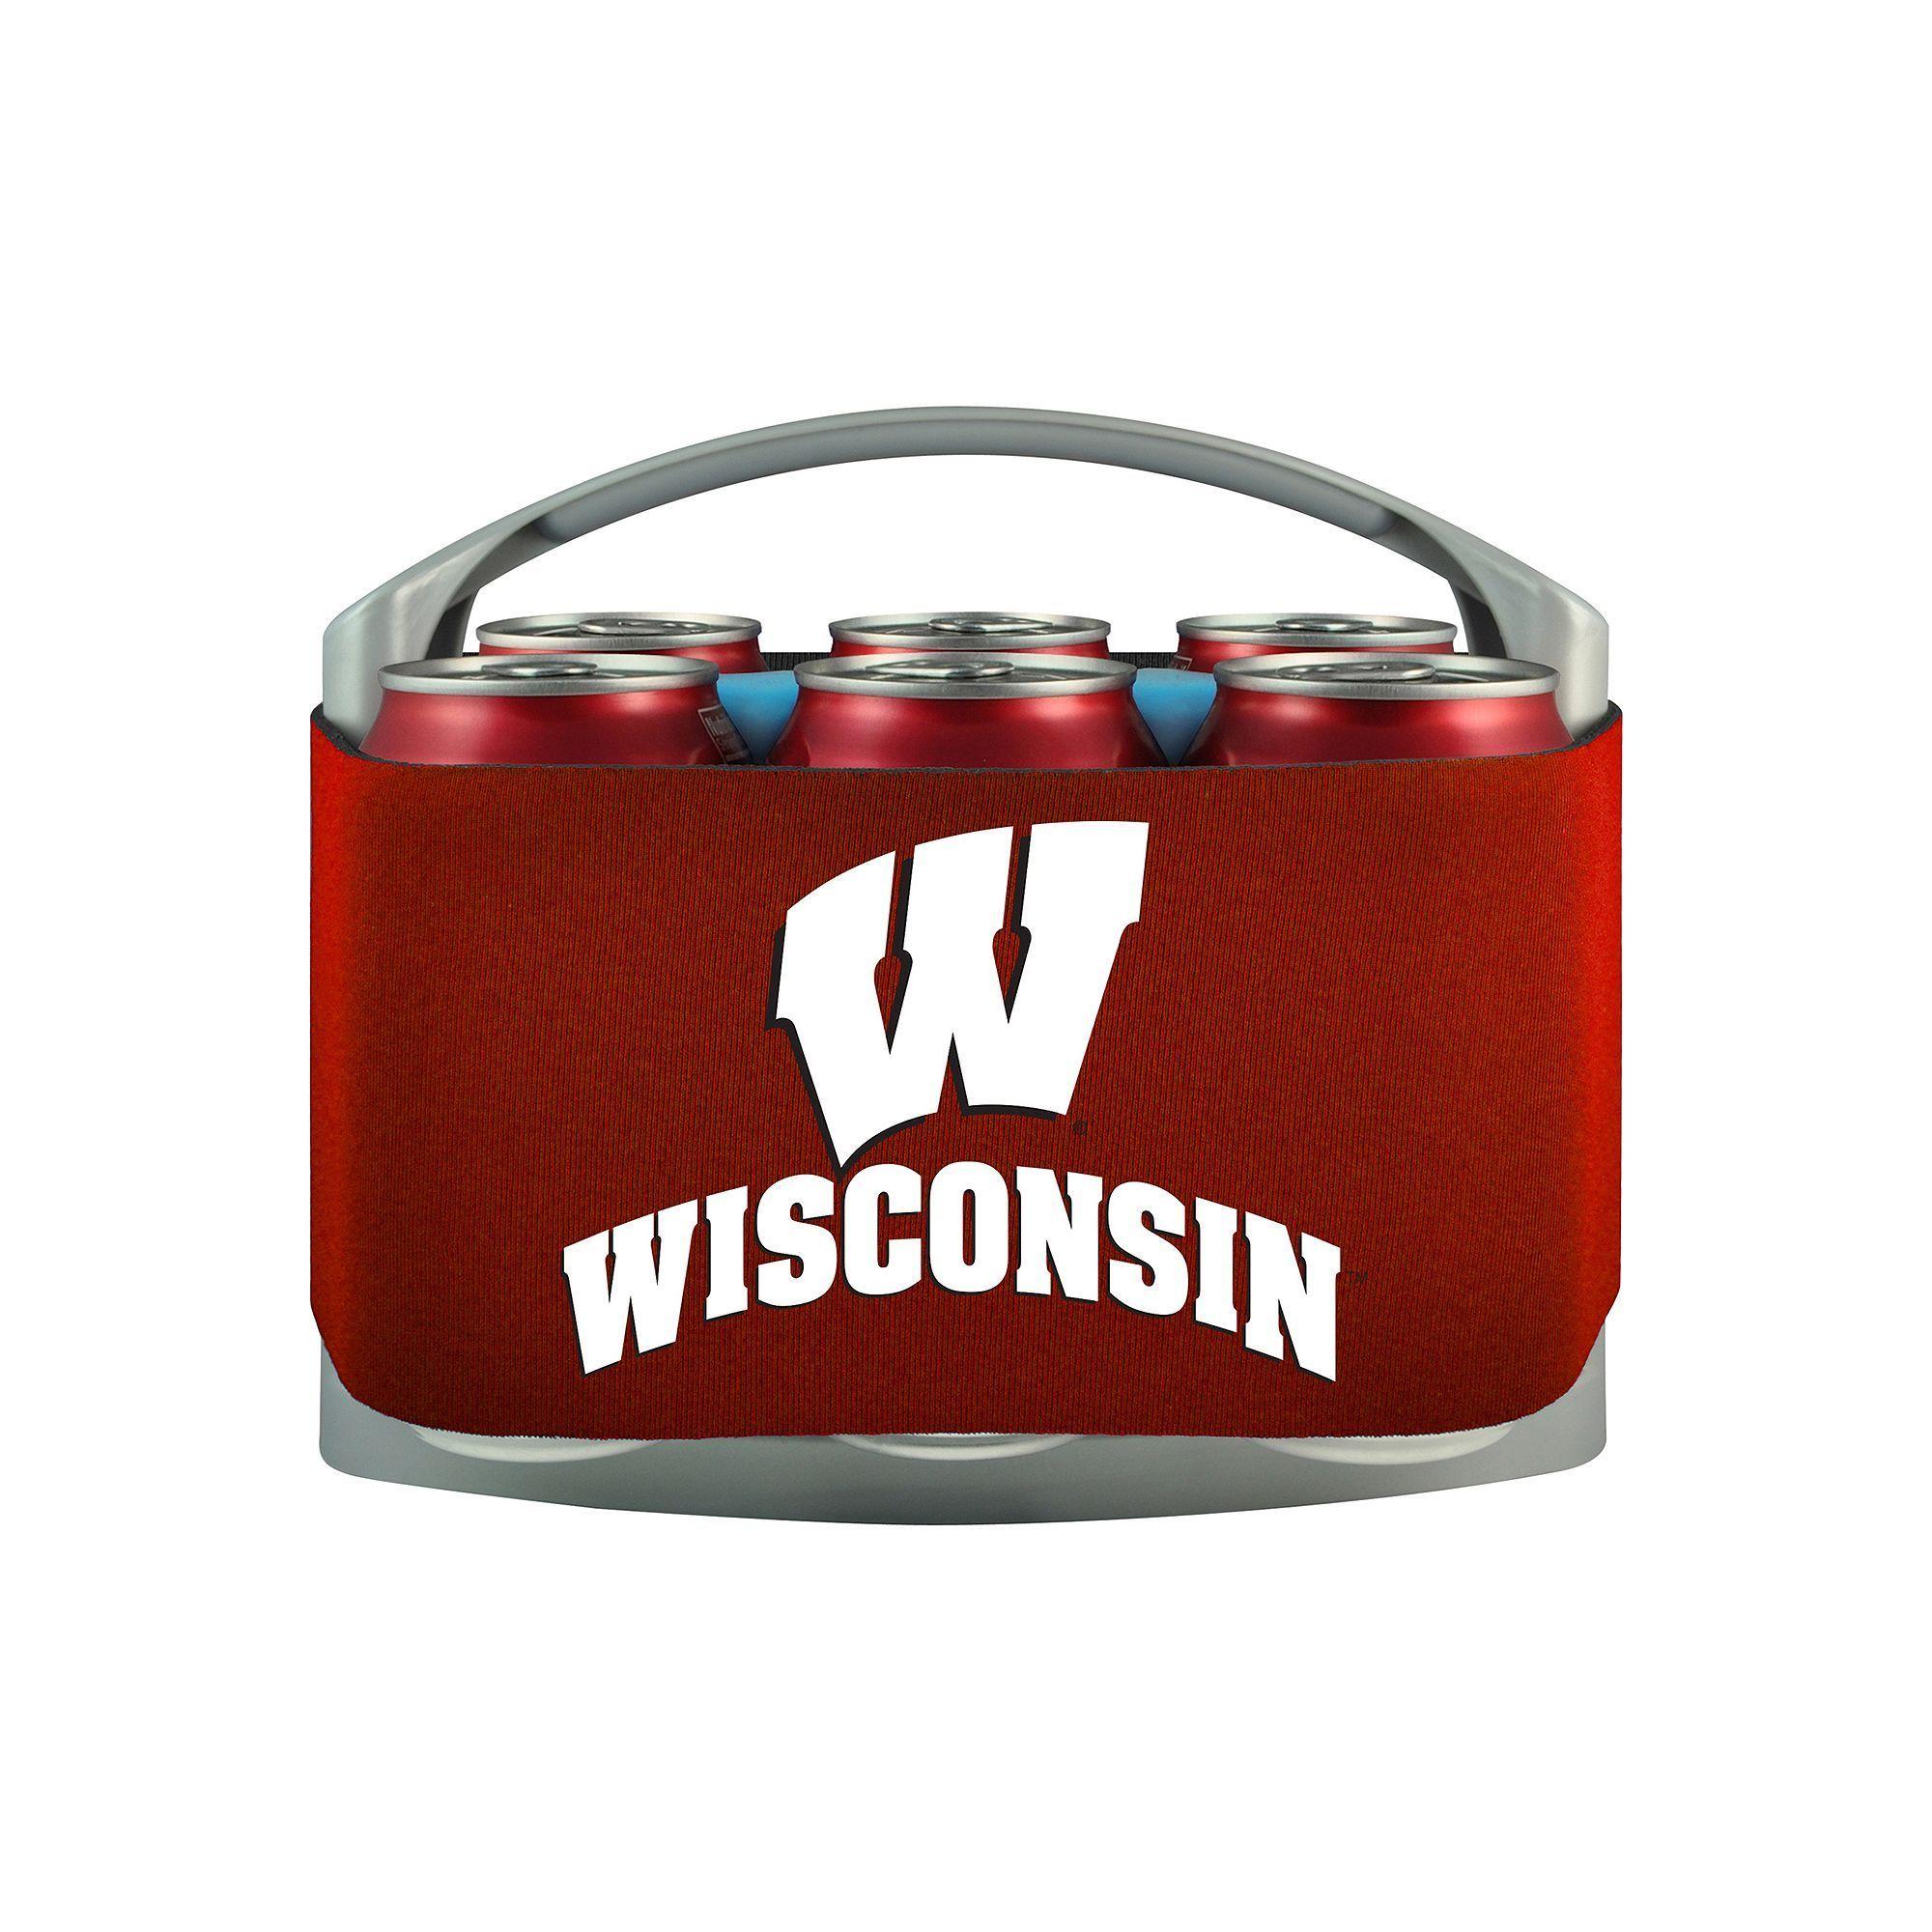 Wisconsin Badgers 6-Pack Cooler Holder, Multicolor